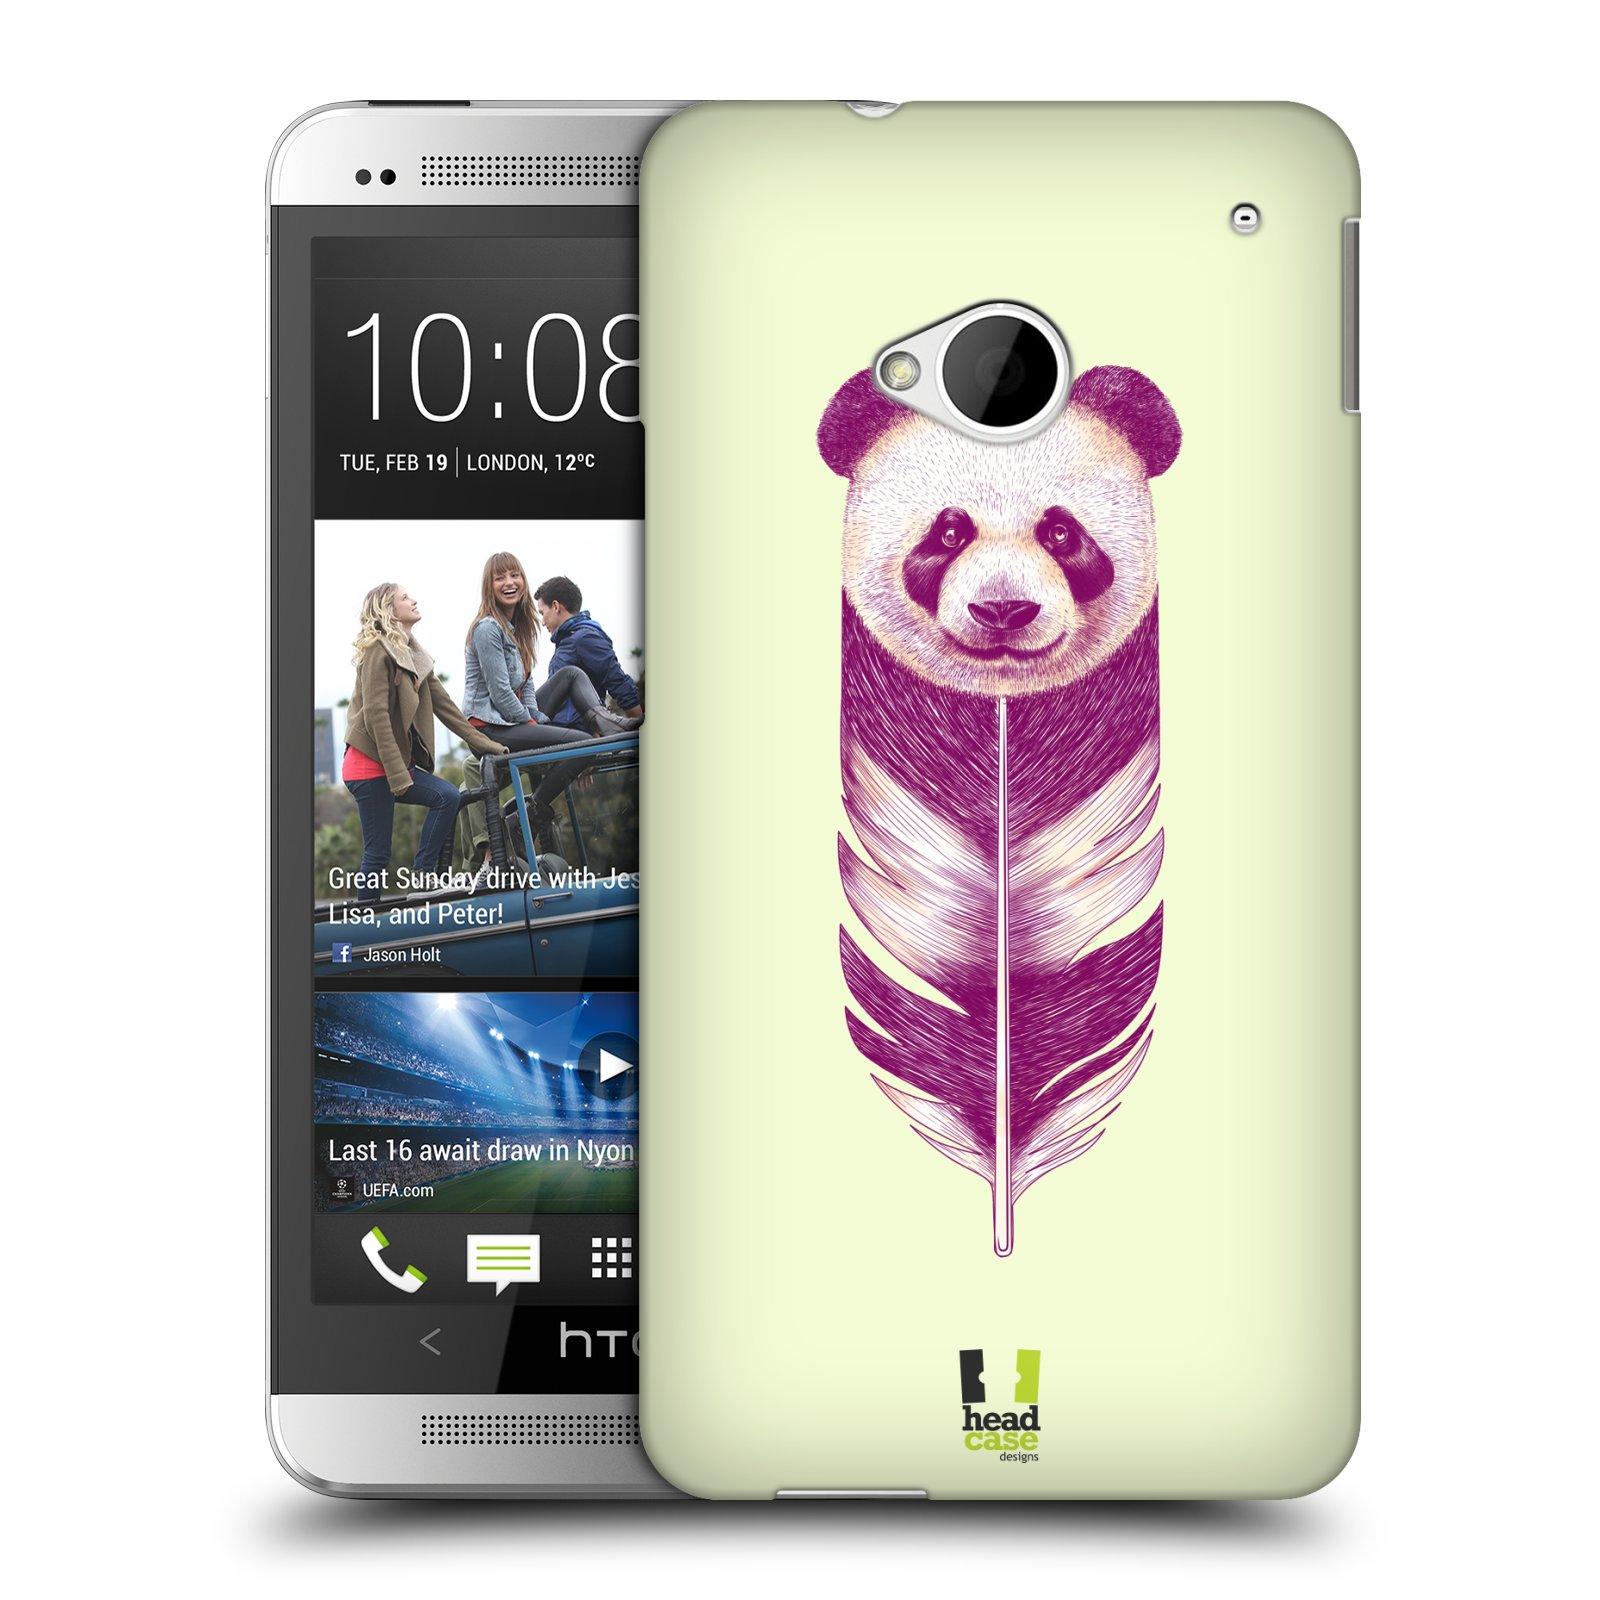 HEAD CASE plastový obal na mobil HTC One (M7) vzor zvířecí pírka panda